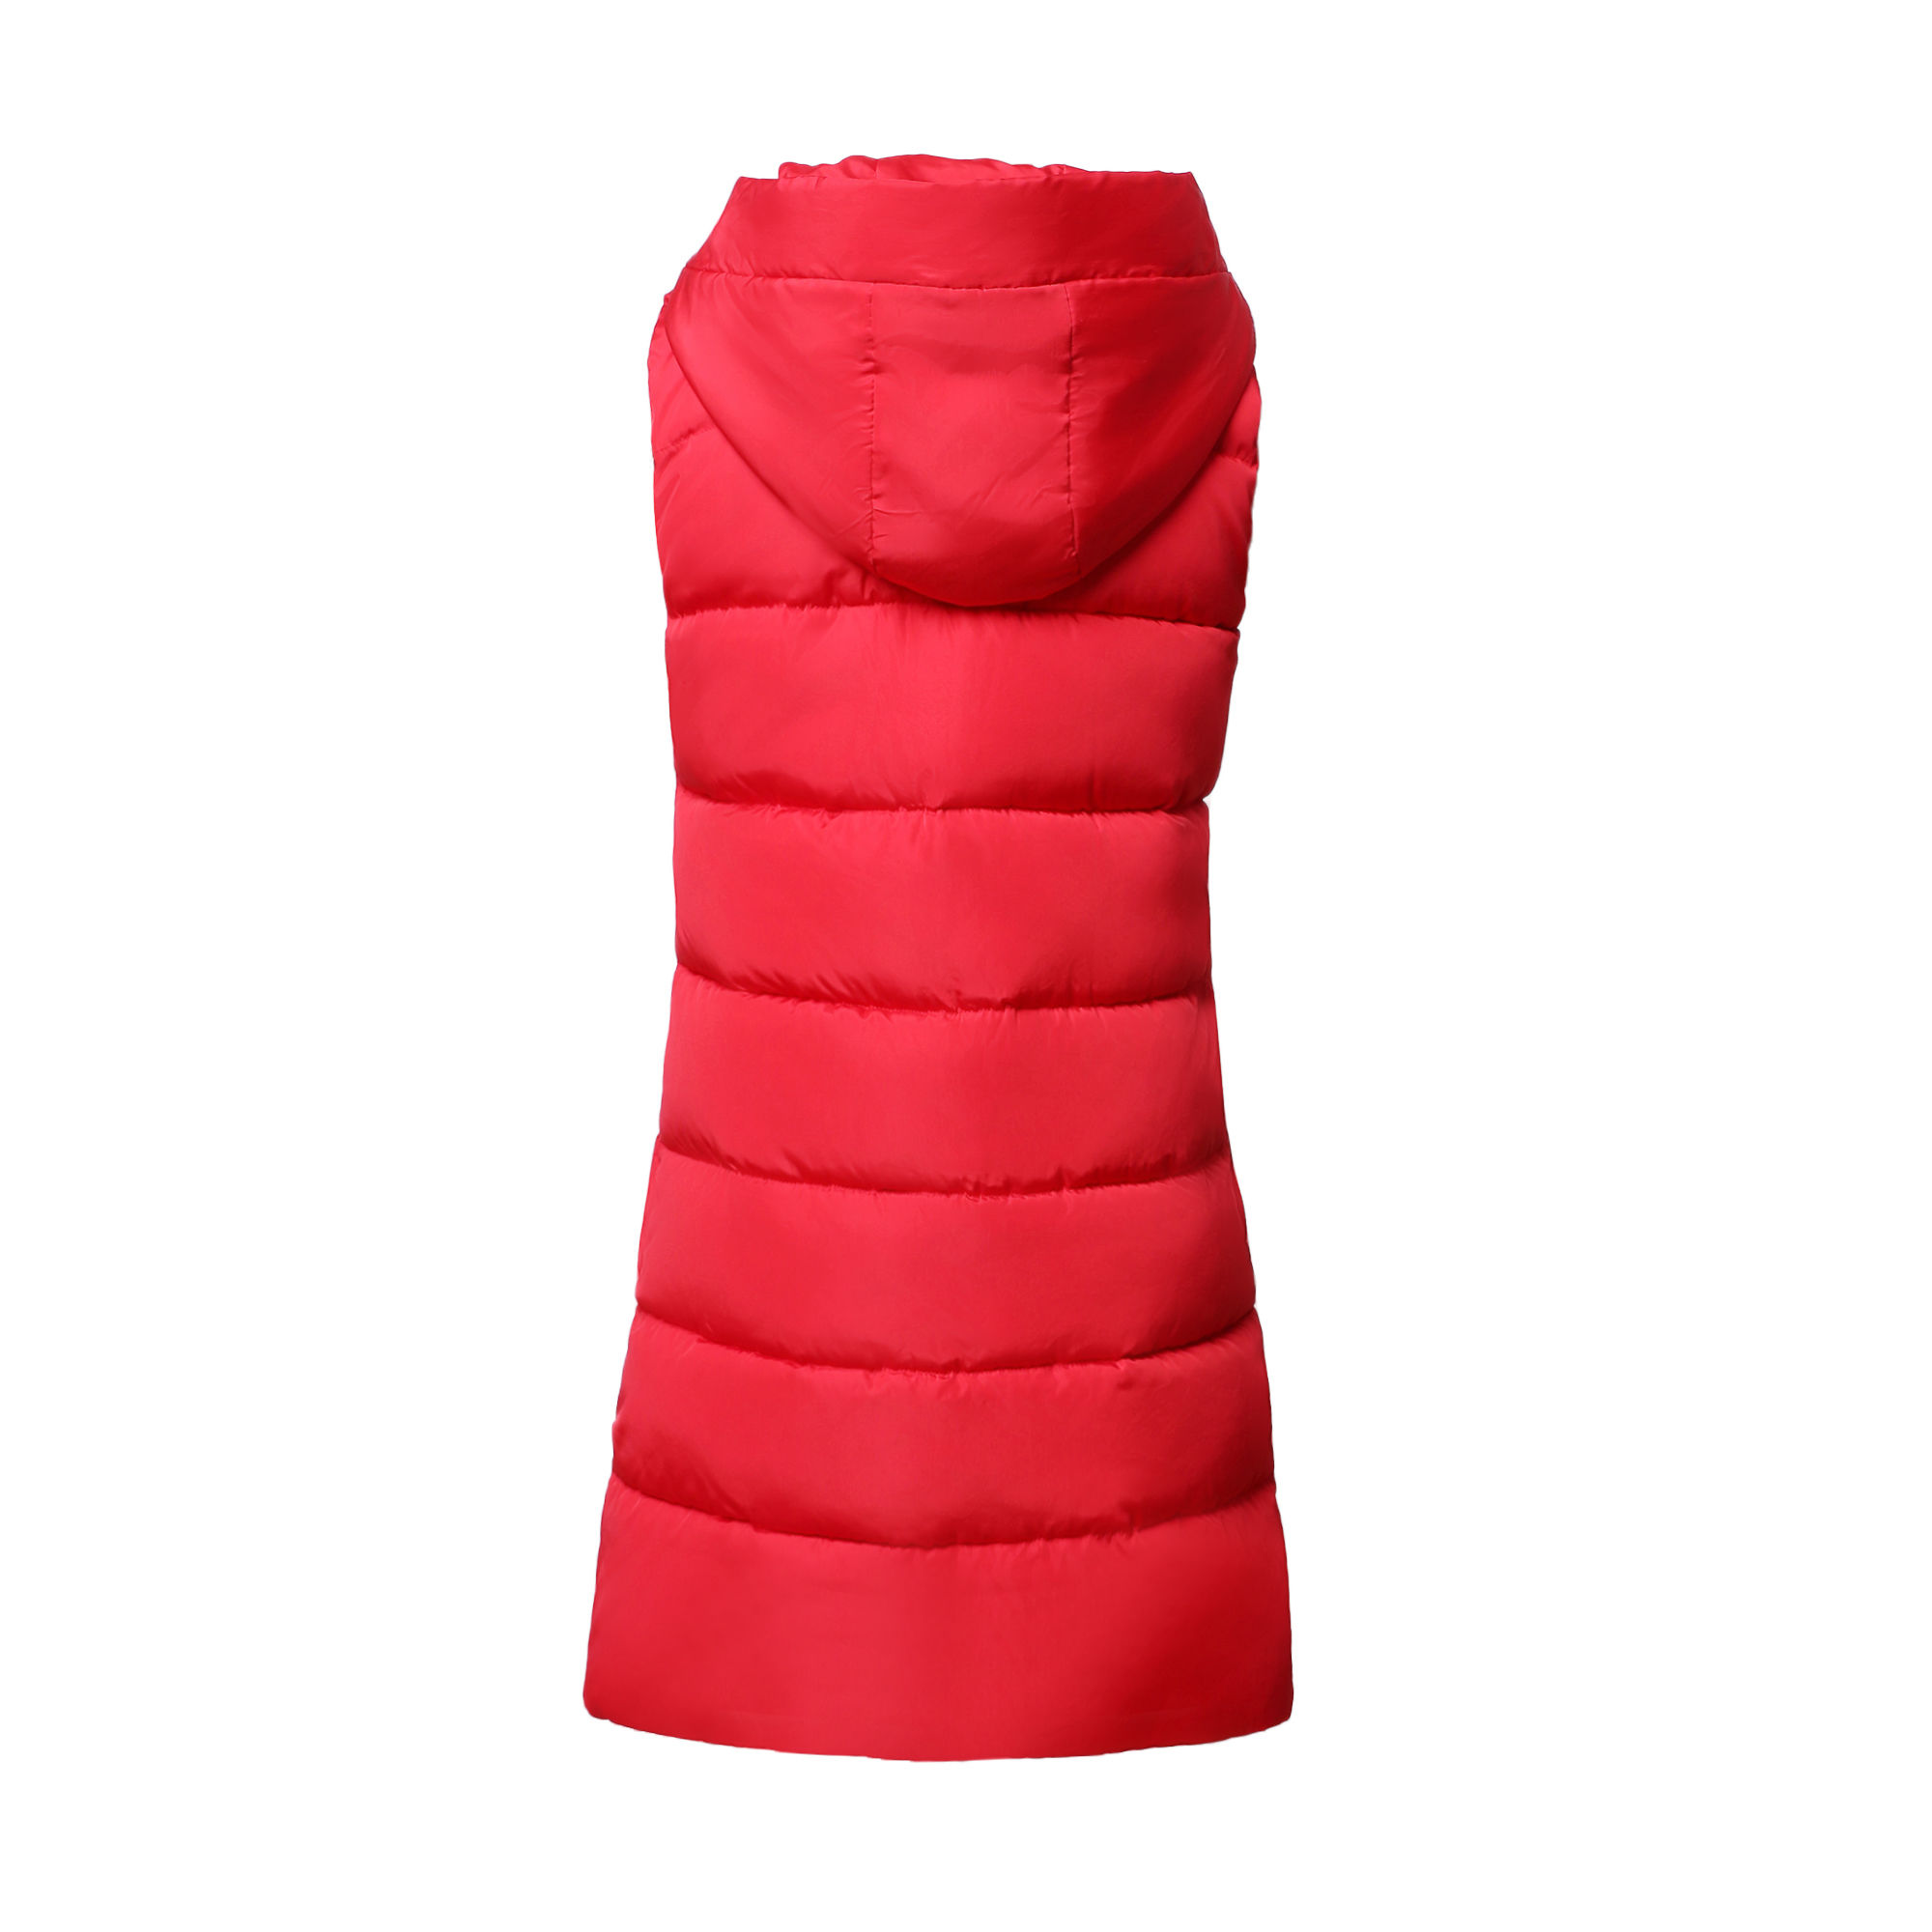 Autumn Winter Women Waistcoat Sleeveless Vest Jacket Hooded Warm Long 5